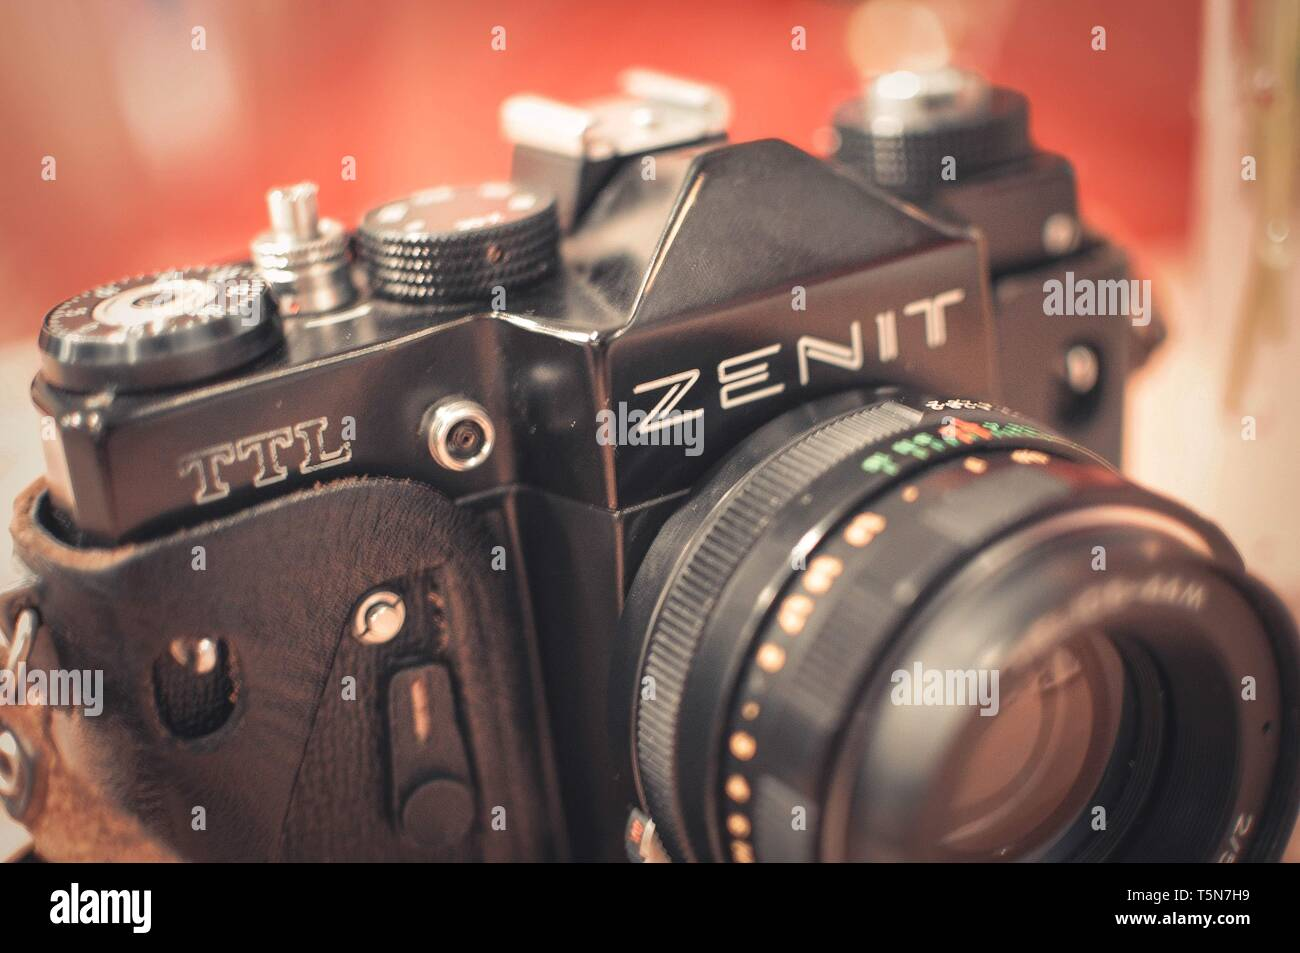 Ternopil, Ukraine - June 20, 2013. The old Soviet camera Zenit TTL - Stock Image